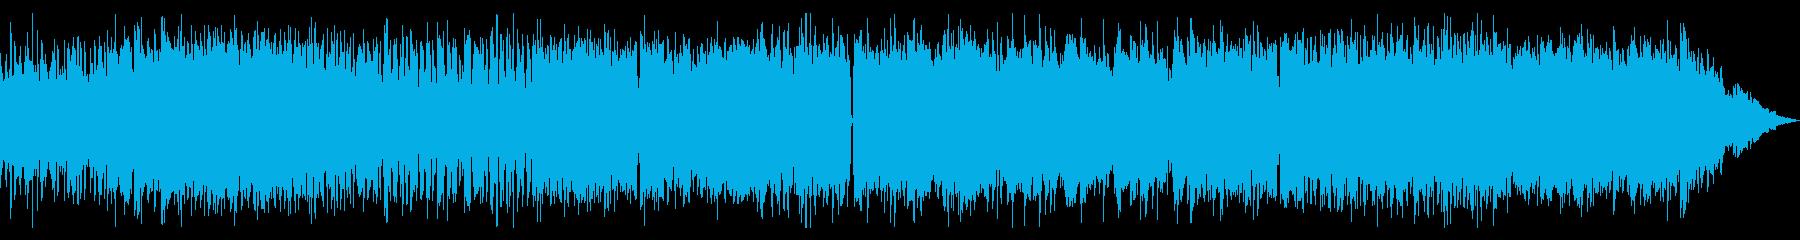 EDM + ヘヴィメタルの再生済みの波形